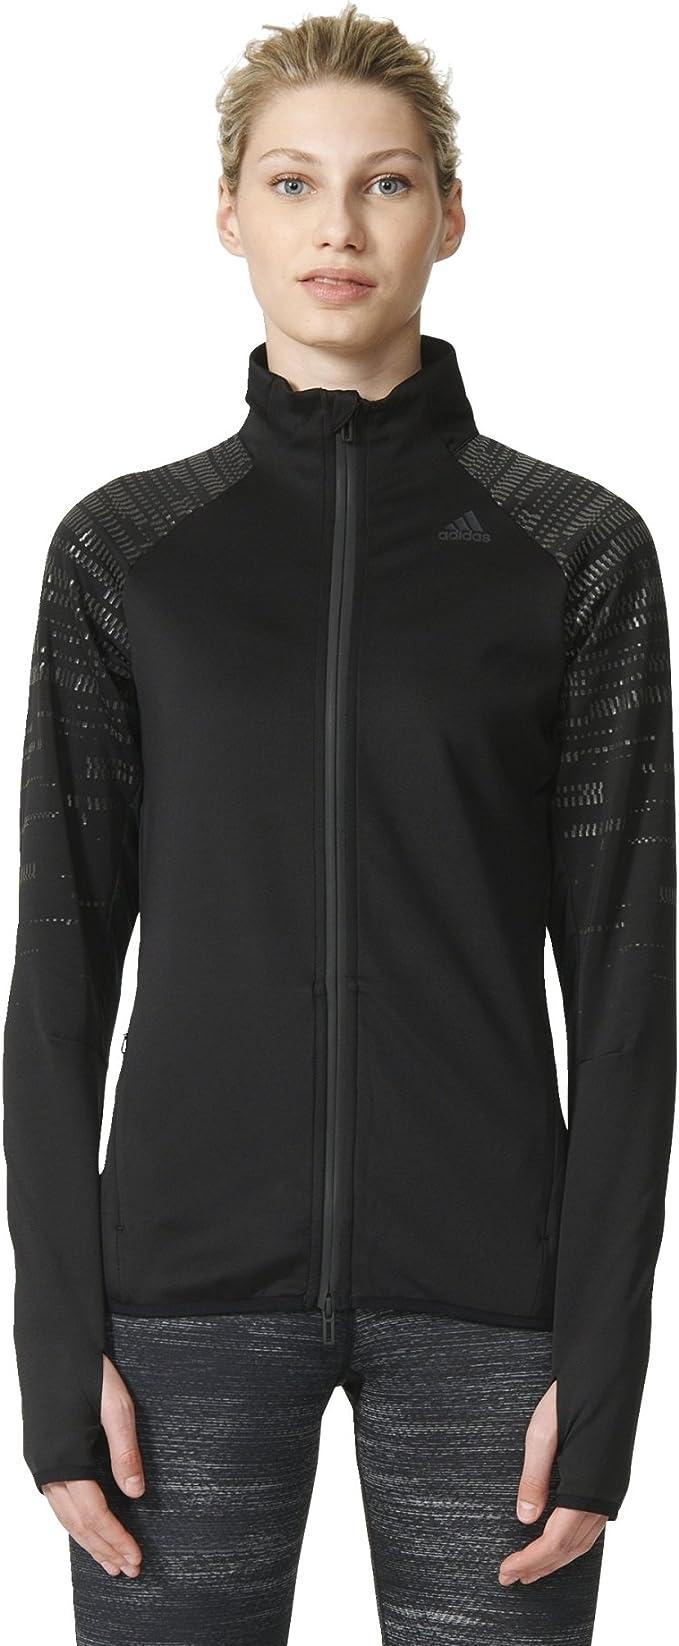 adidas Performance Women's Track Jacket